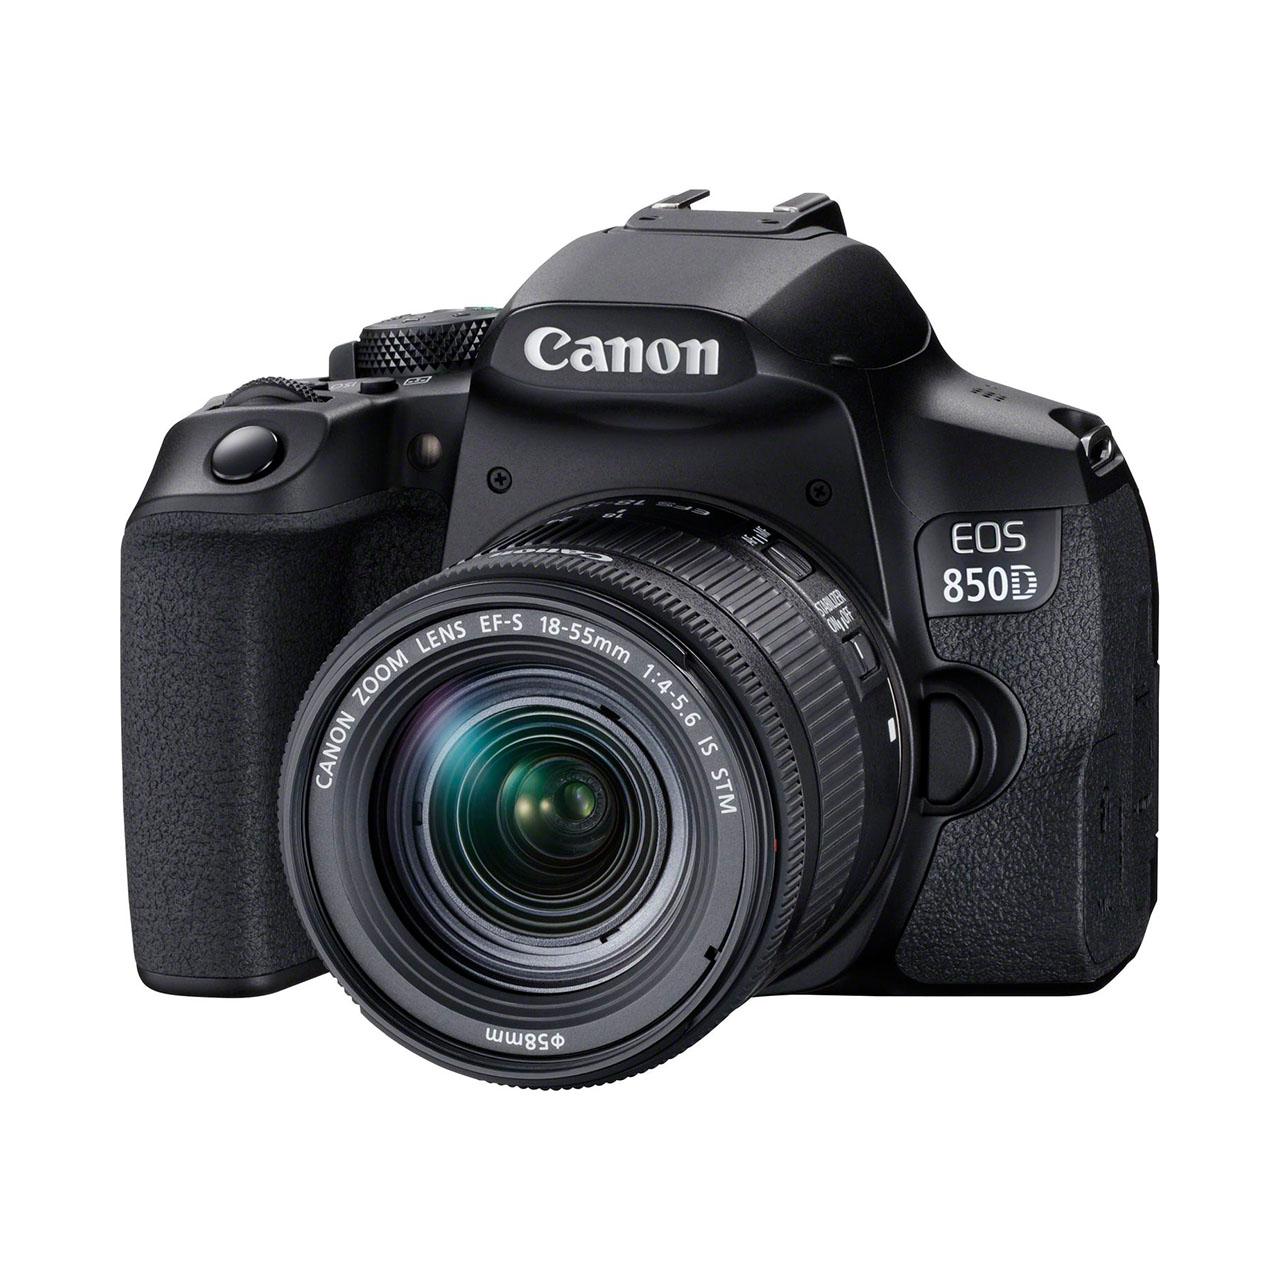 Canon Cámara Reflex Eos 850D Kit Objetivo EF-S 18-55mm IS STM